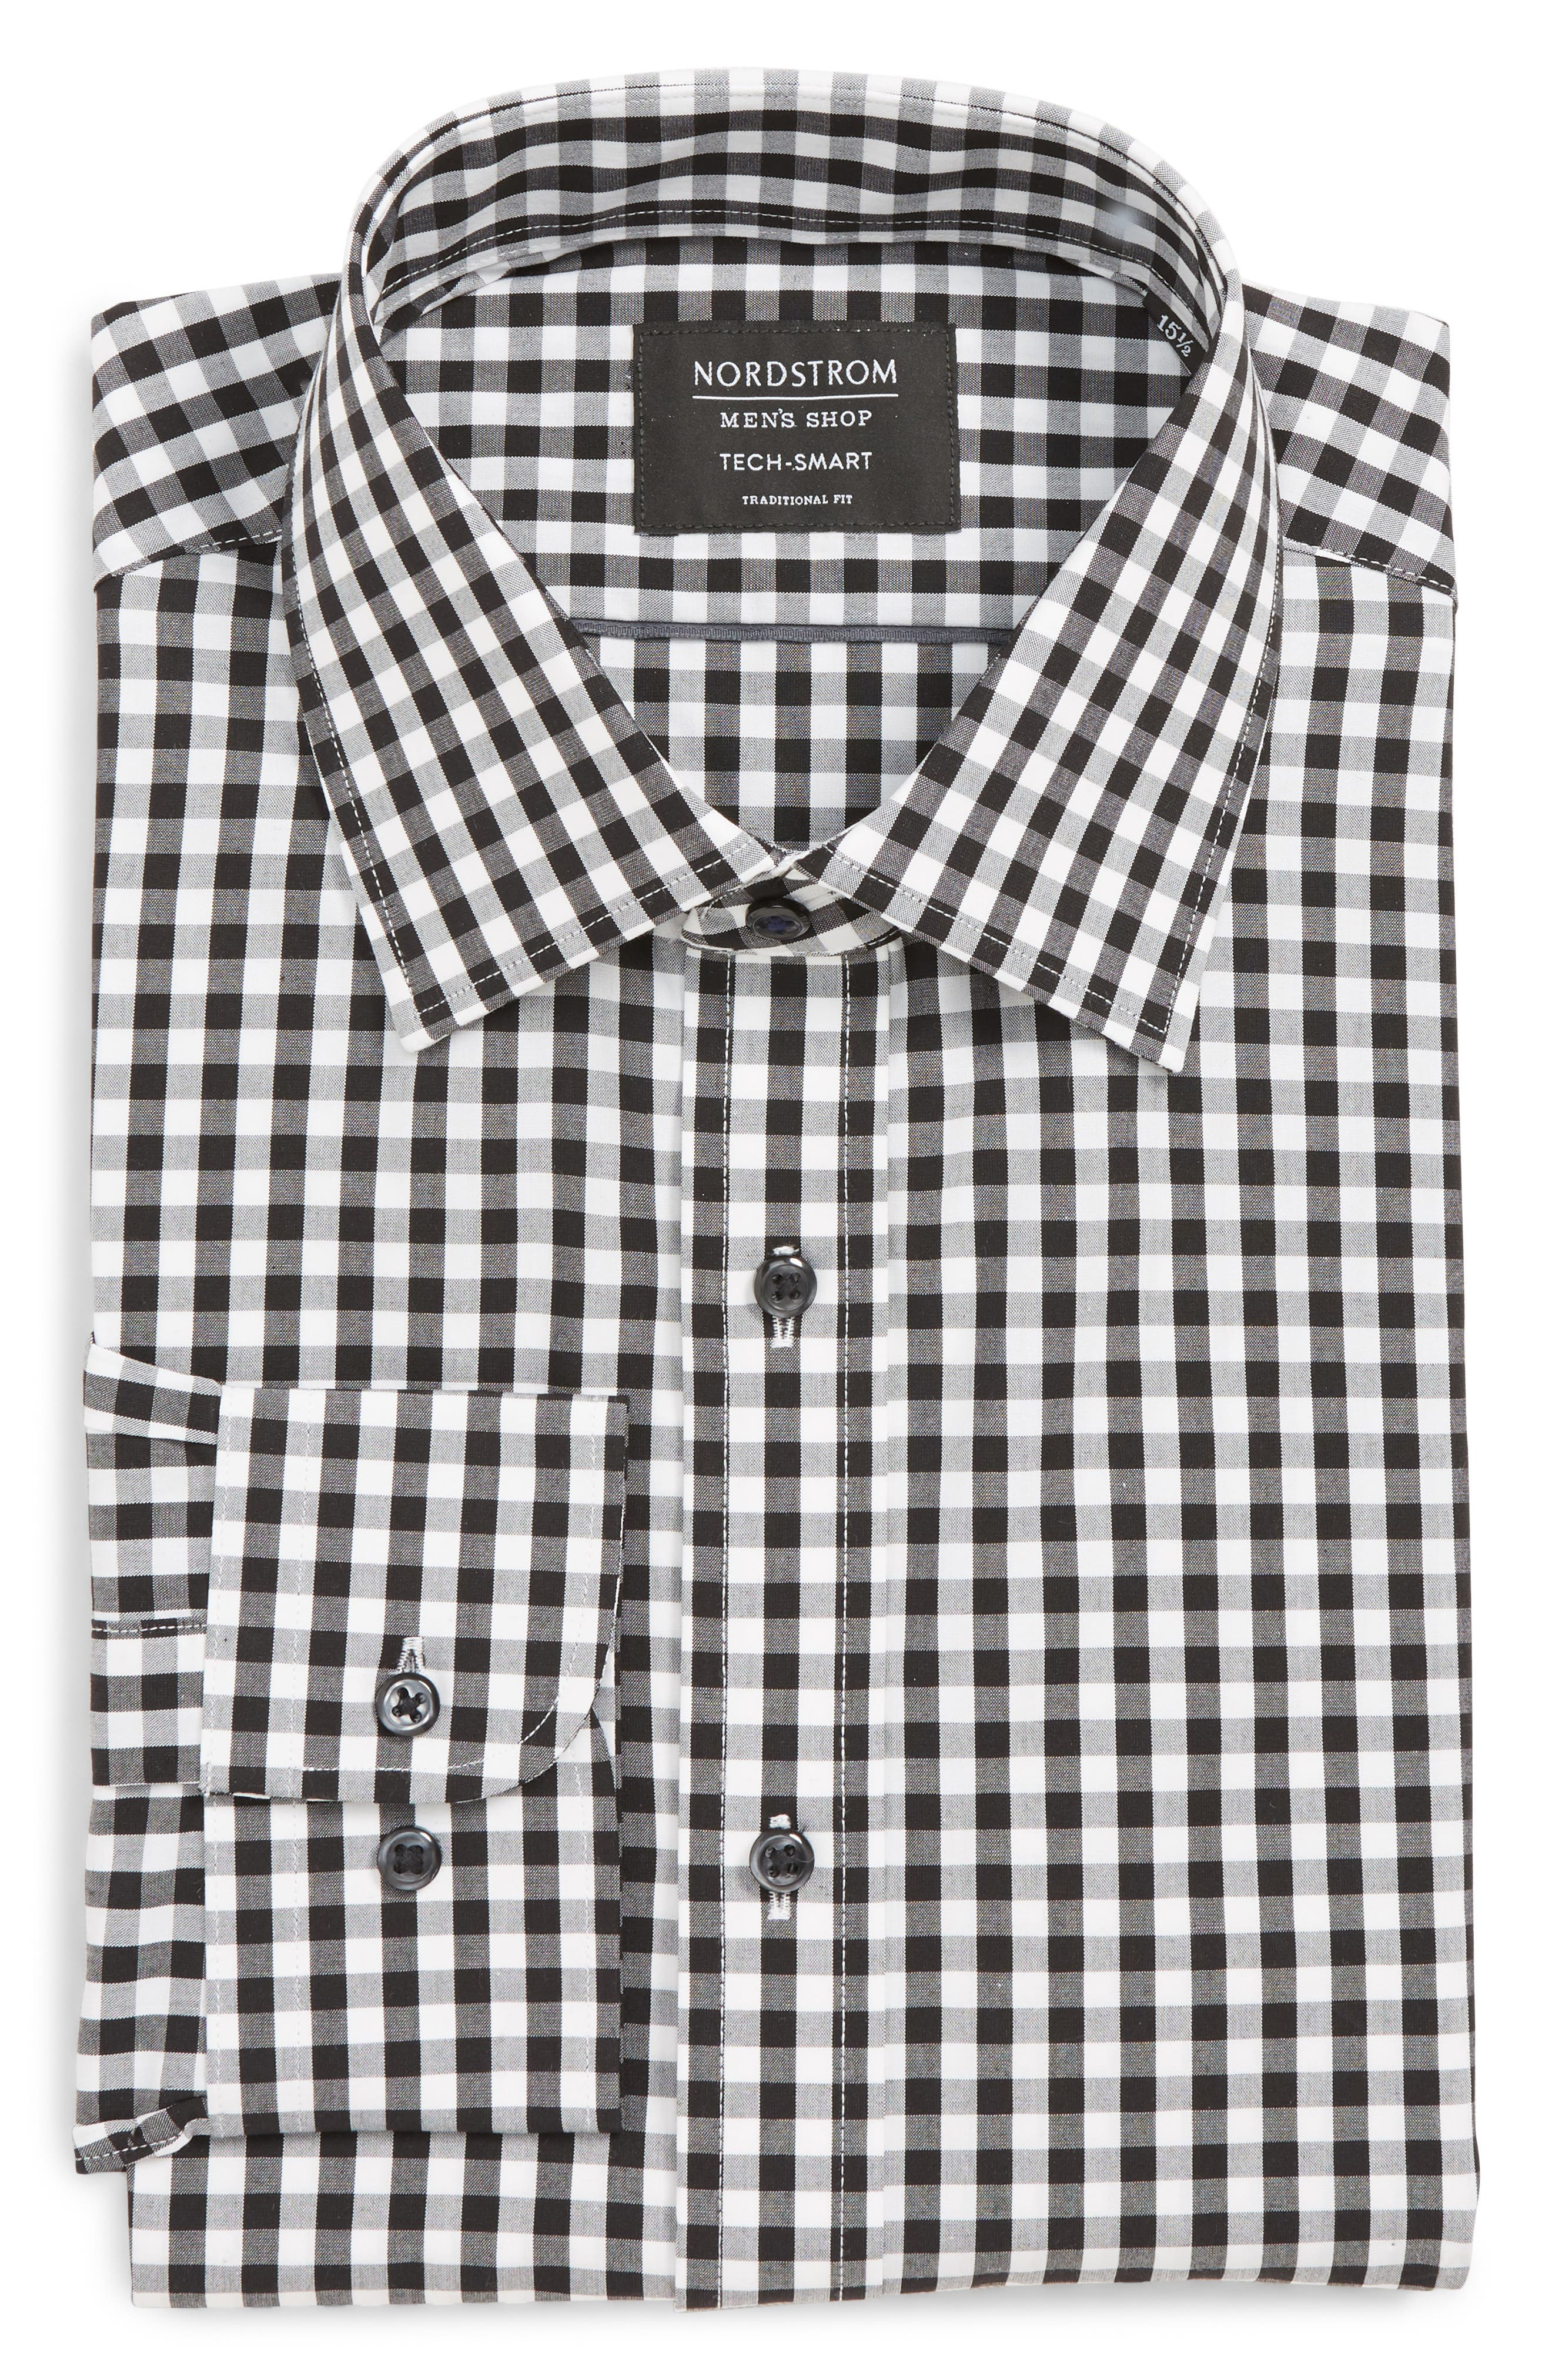 NORDSTROM MEN'S SHOP, Tech-Smart Traditional Fit Stretch Check Dress Shirt, Alternate thumbnail 5, color, BLACK ROCK